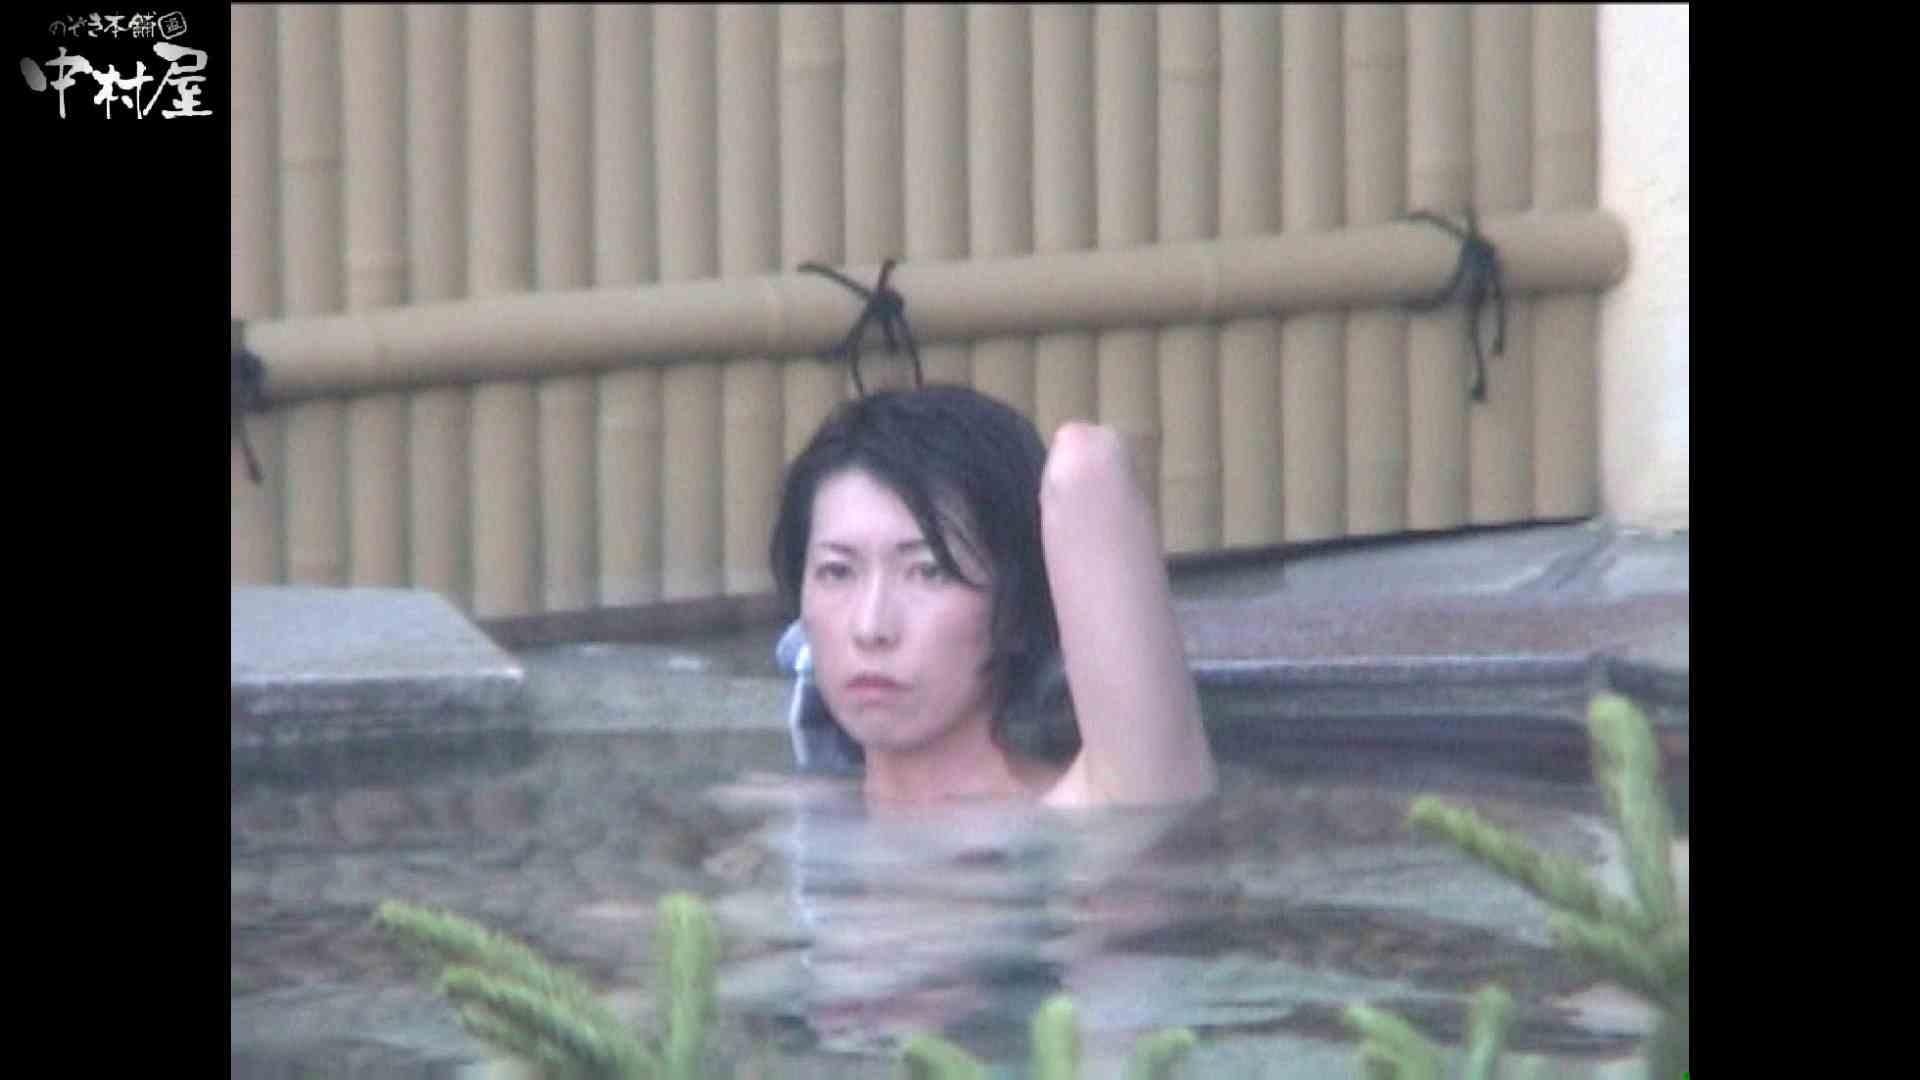 Aquaな露天風呂Vol.987 0  61連発 12